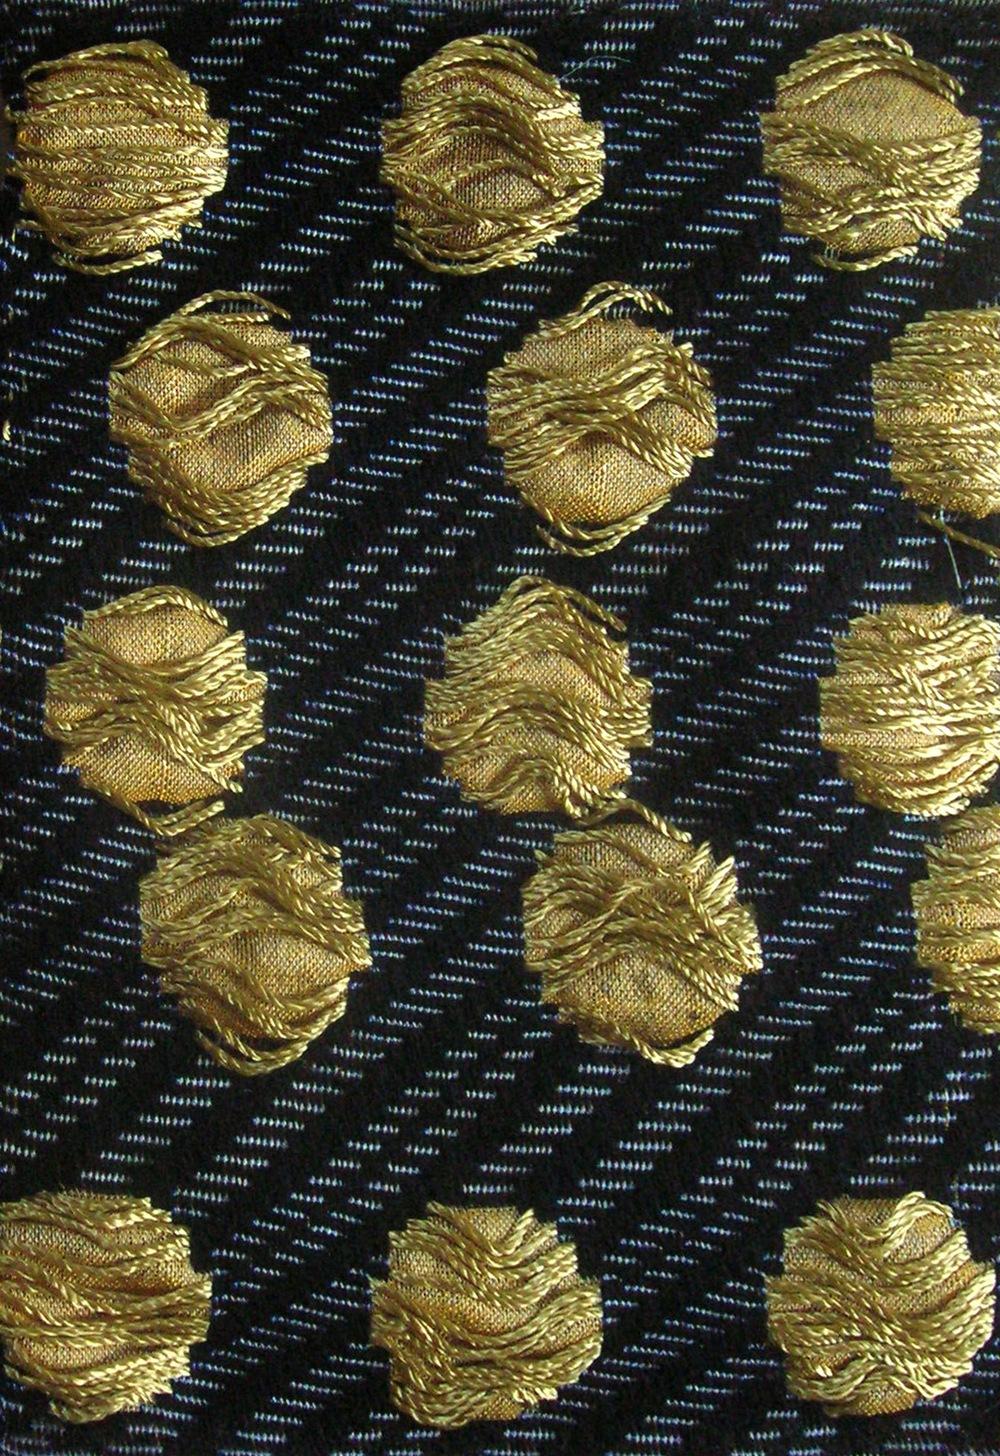 Weaving 22.jpg